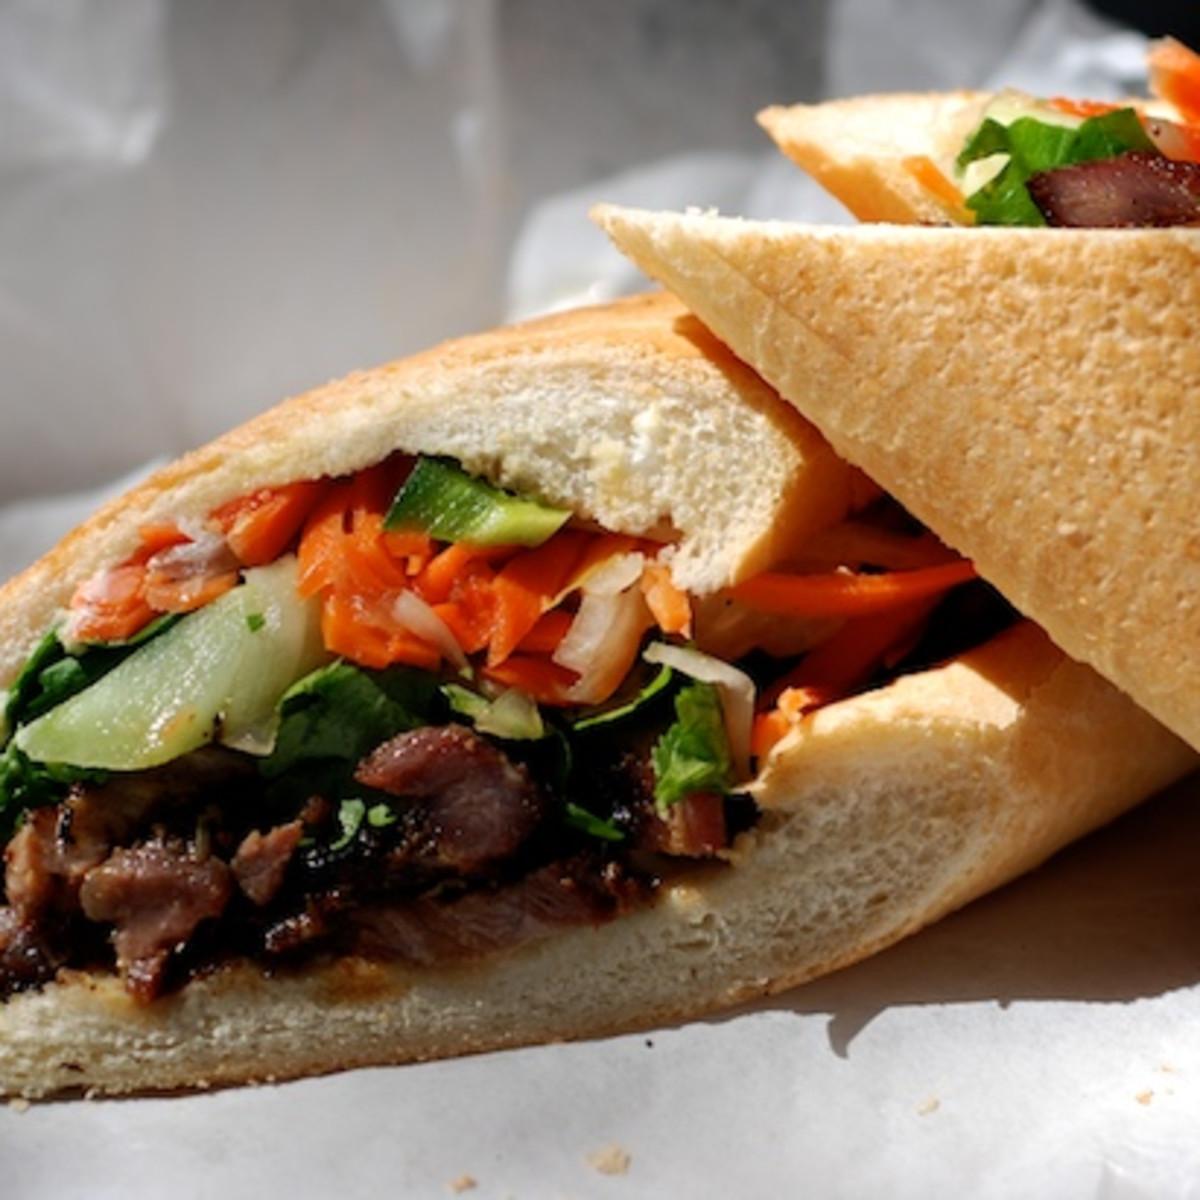 Austin Photo: Place_Food_lulu_b's_sandwich